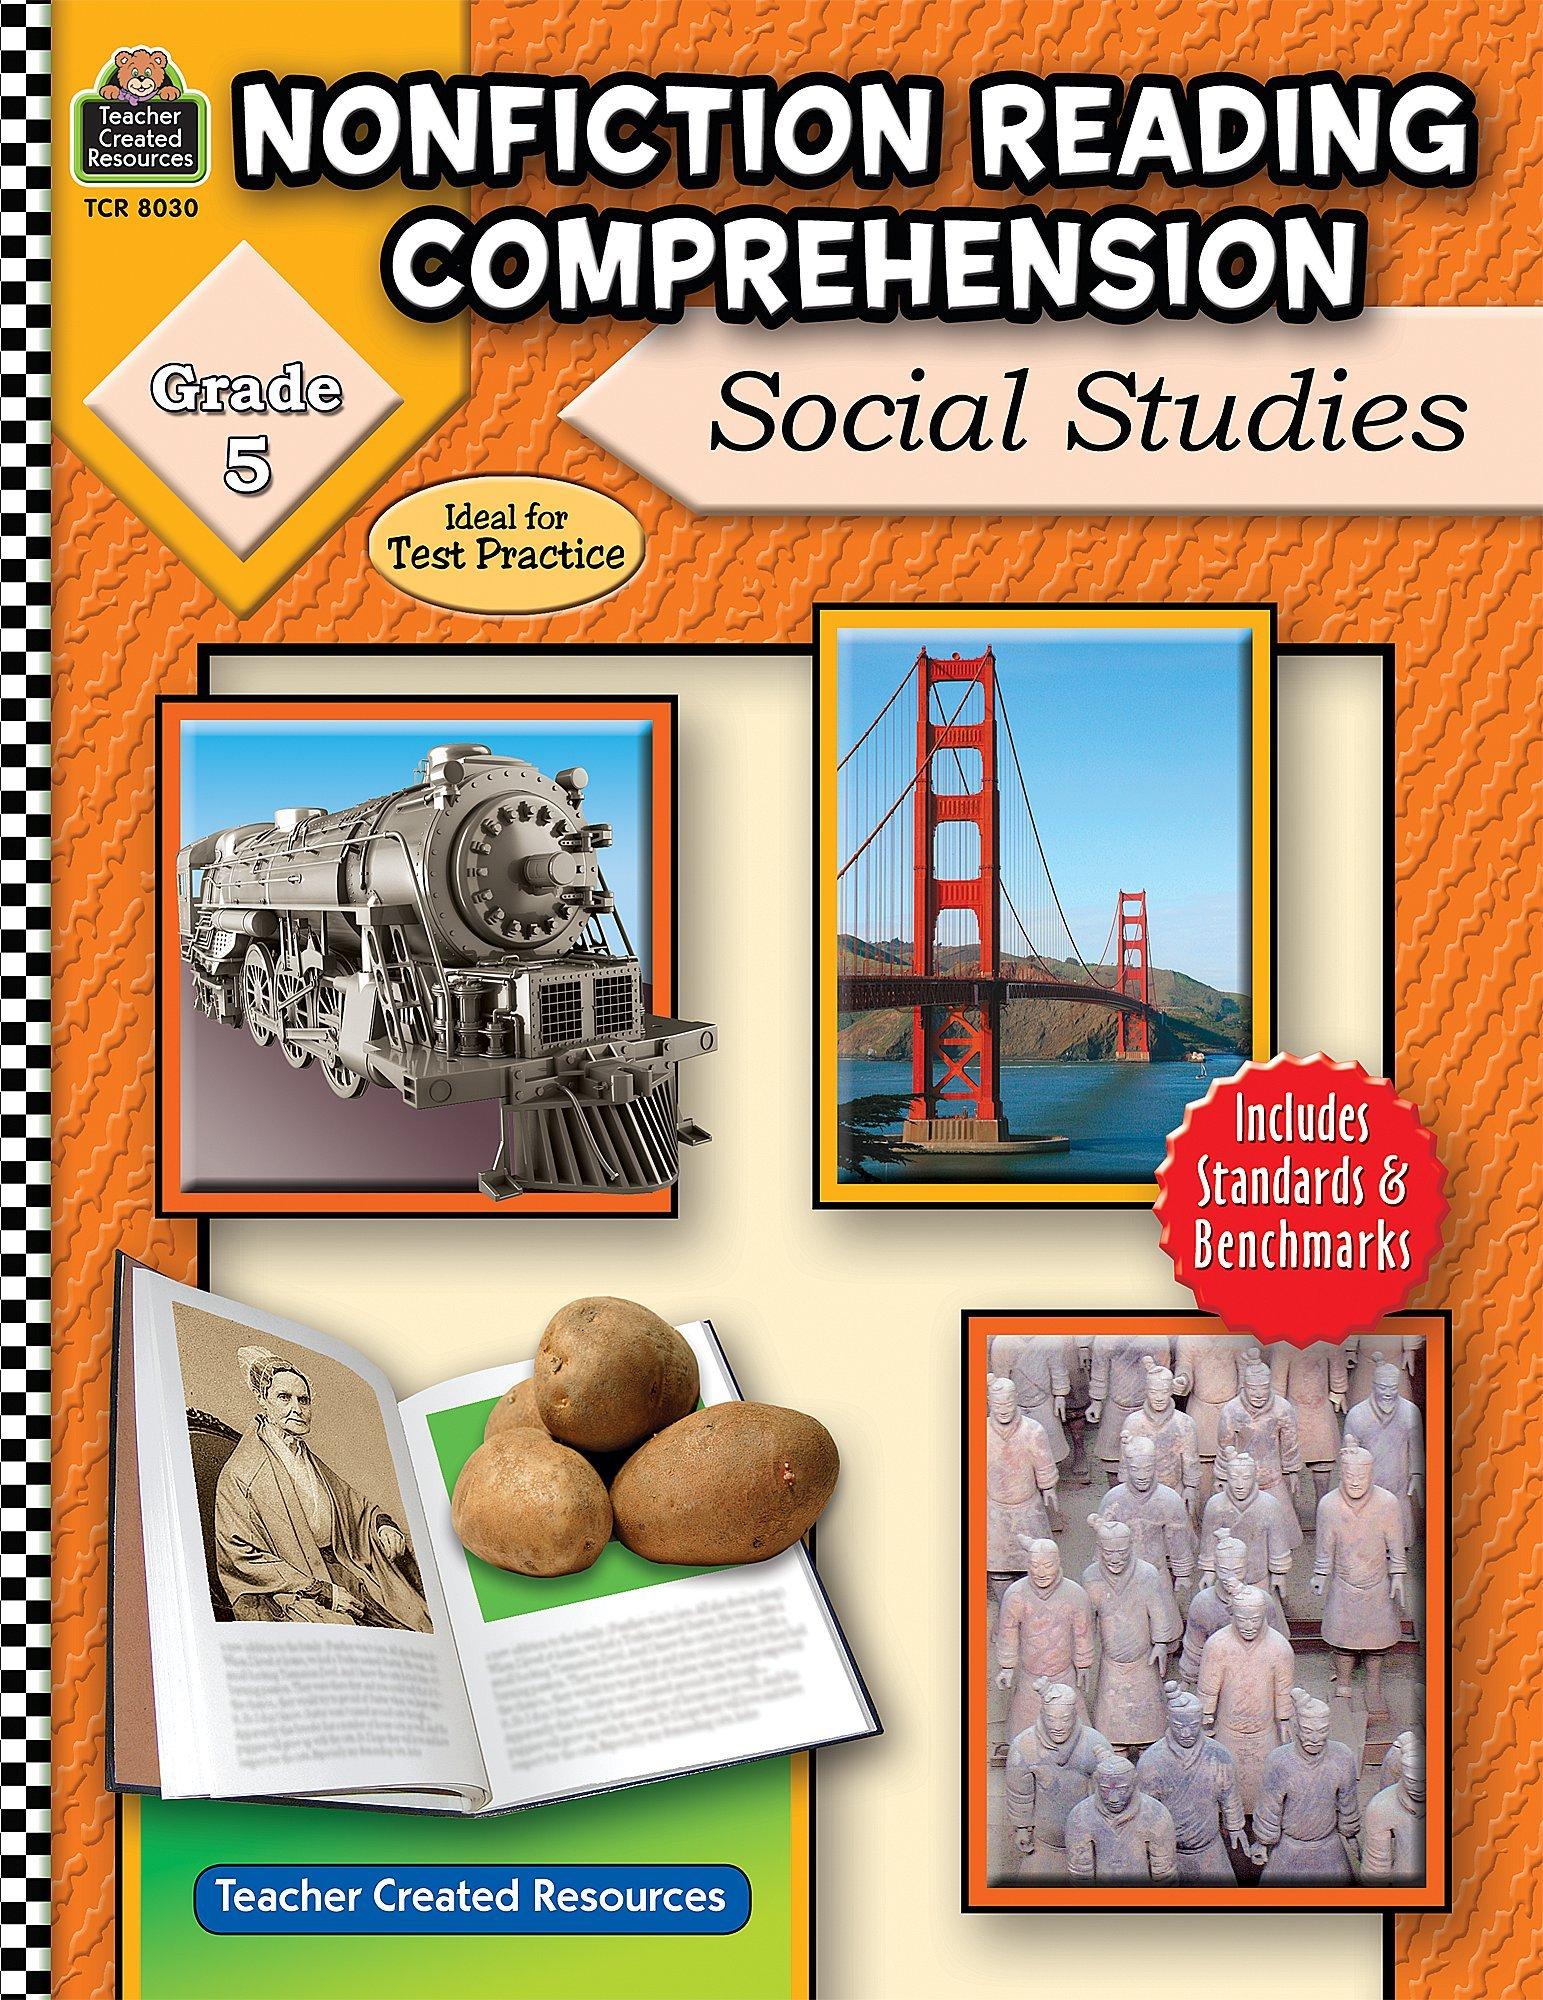 Worksheets Social Studies Reading Comprehension Worksheets amazon com nonfiction reading comprehension social studies grade 5 0088231980308 ruth foster books